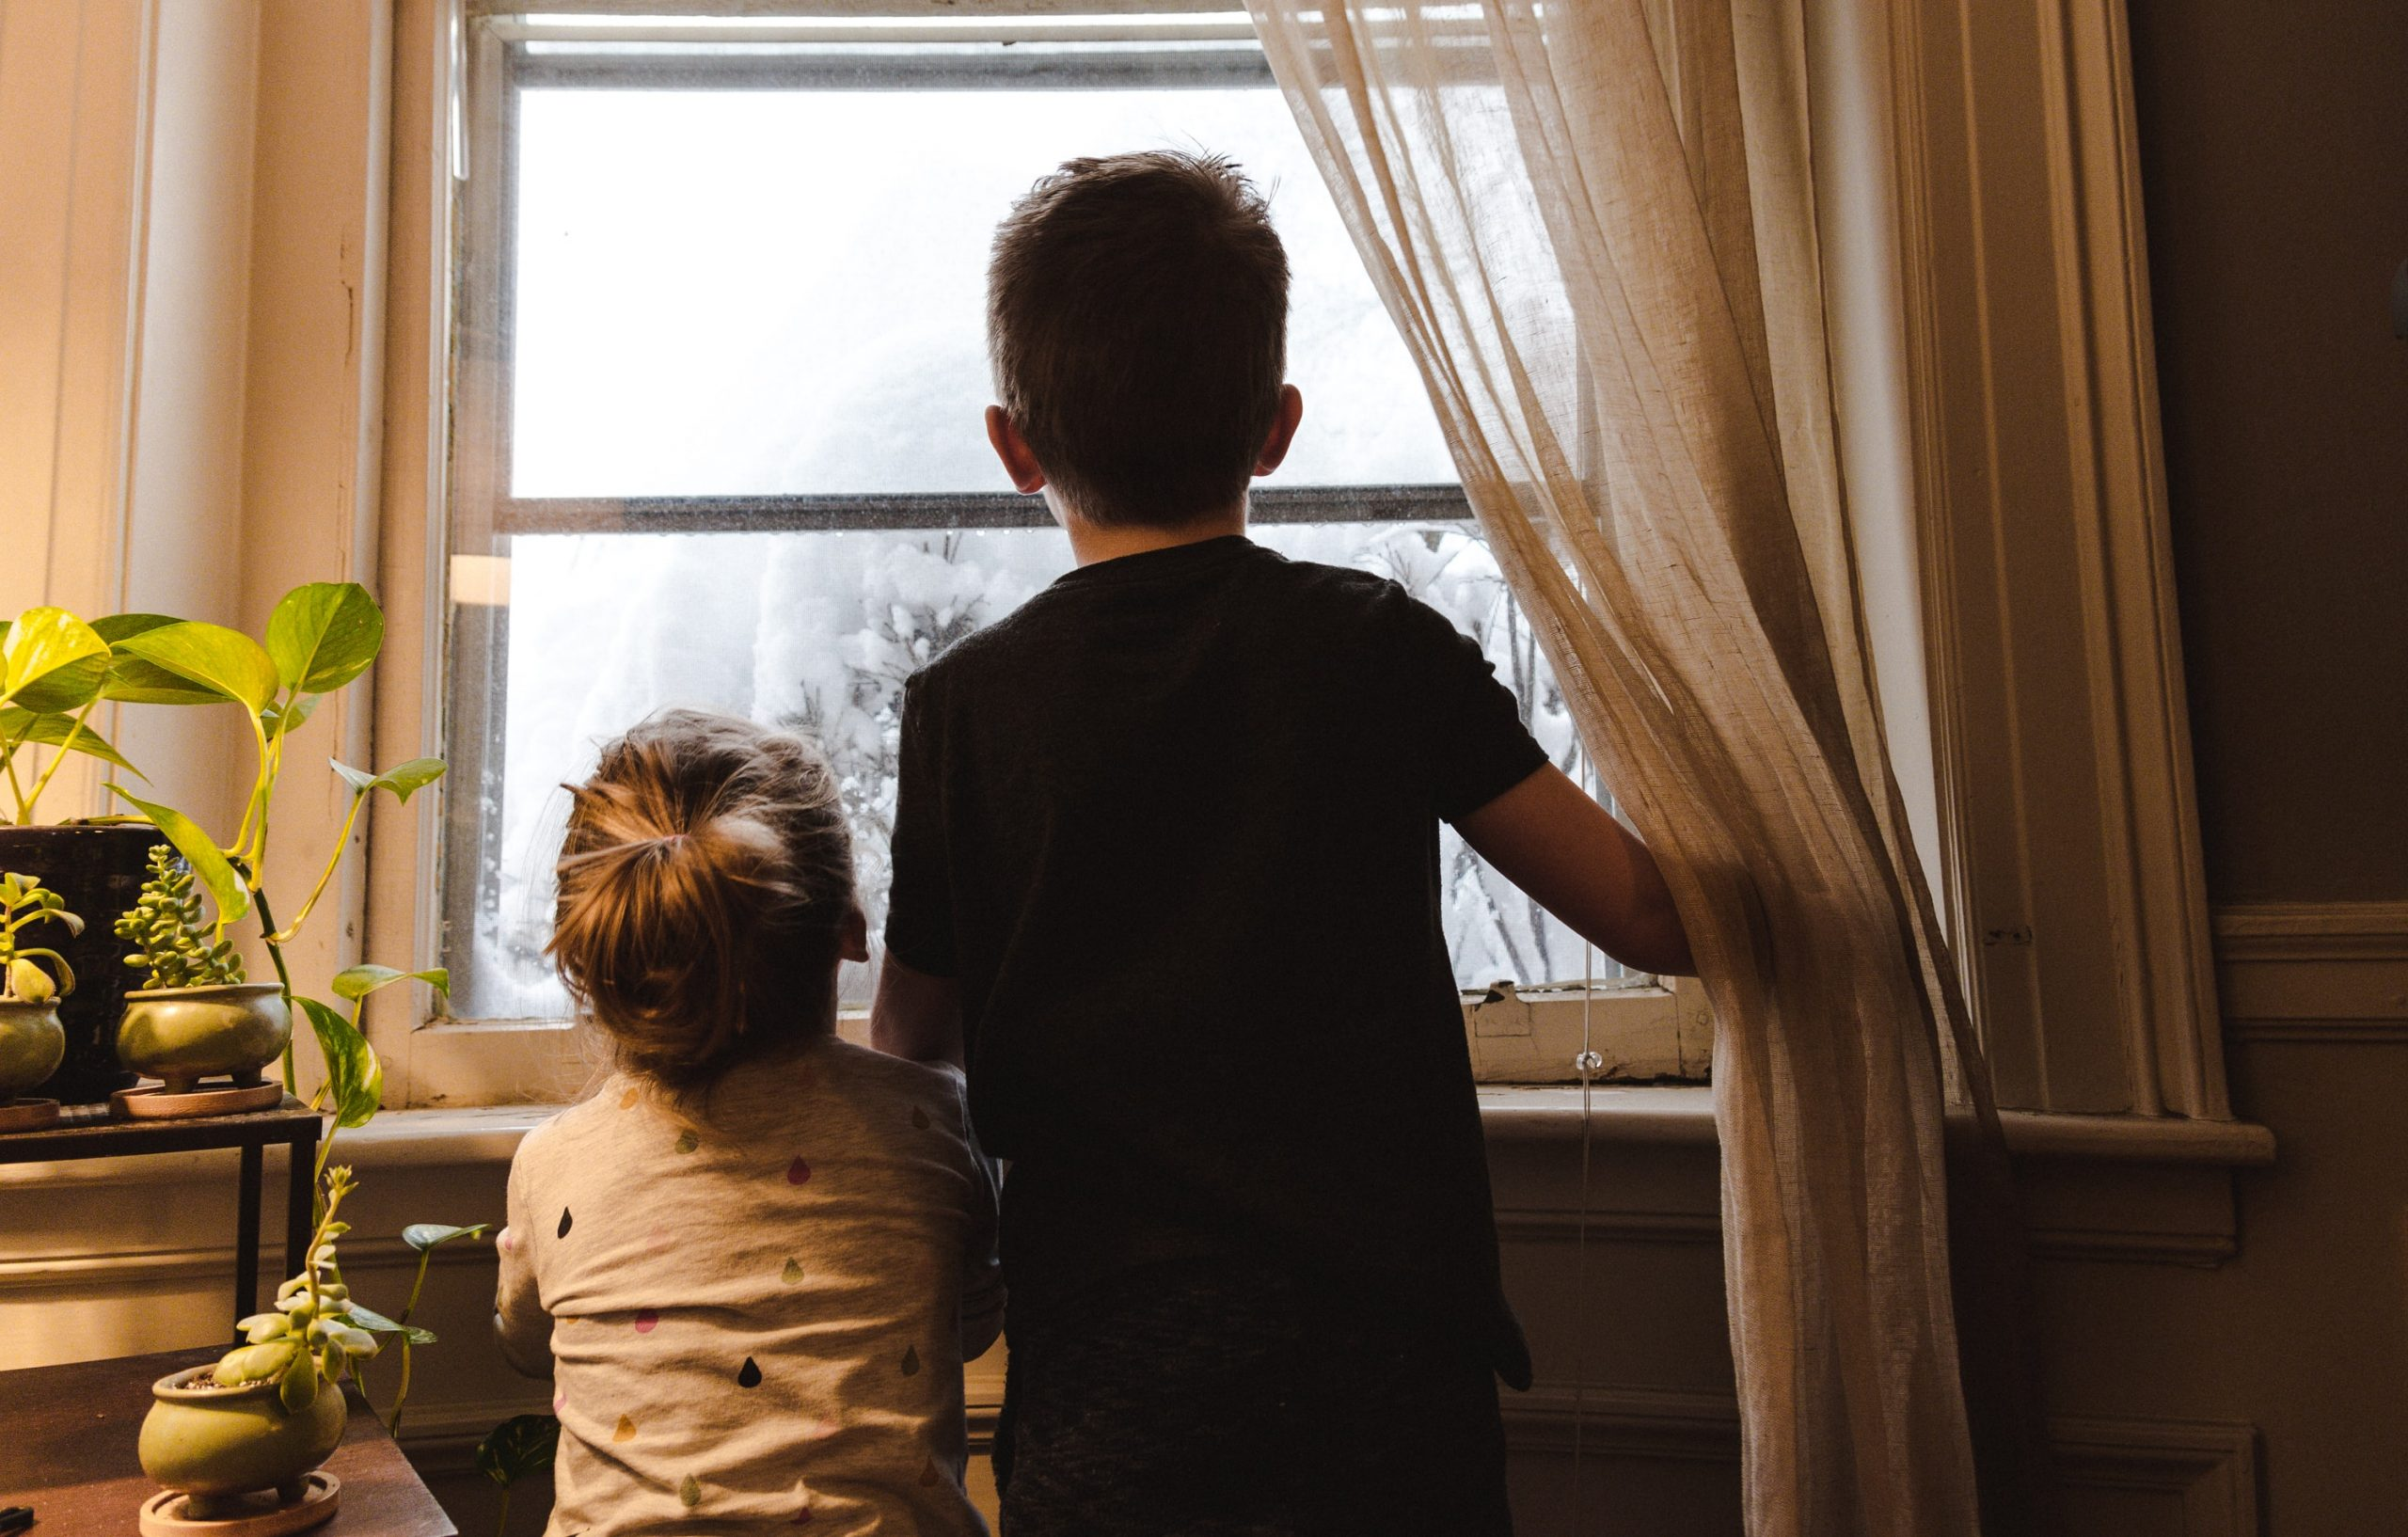 confinement organisation parents